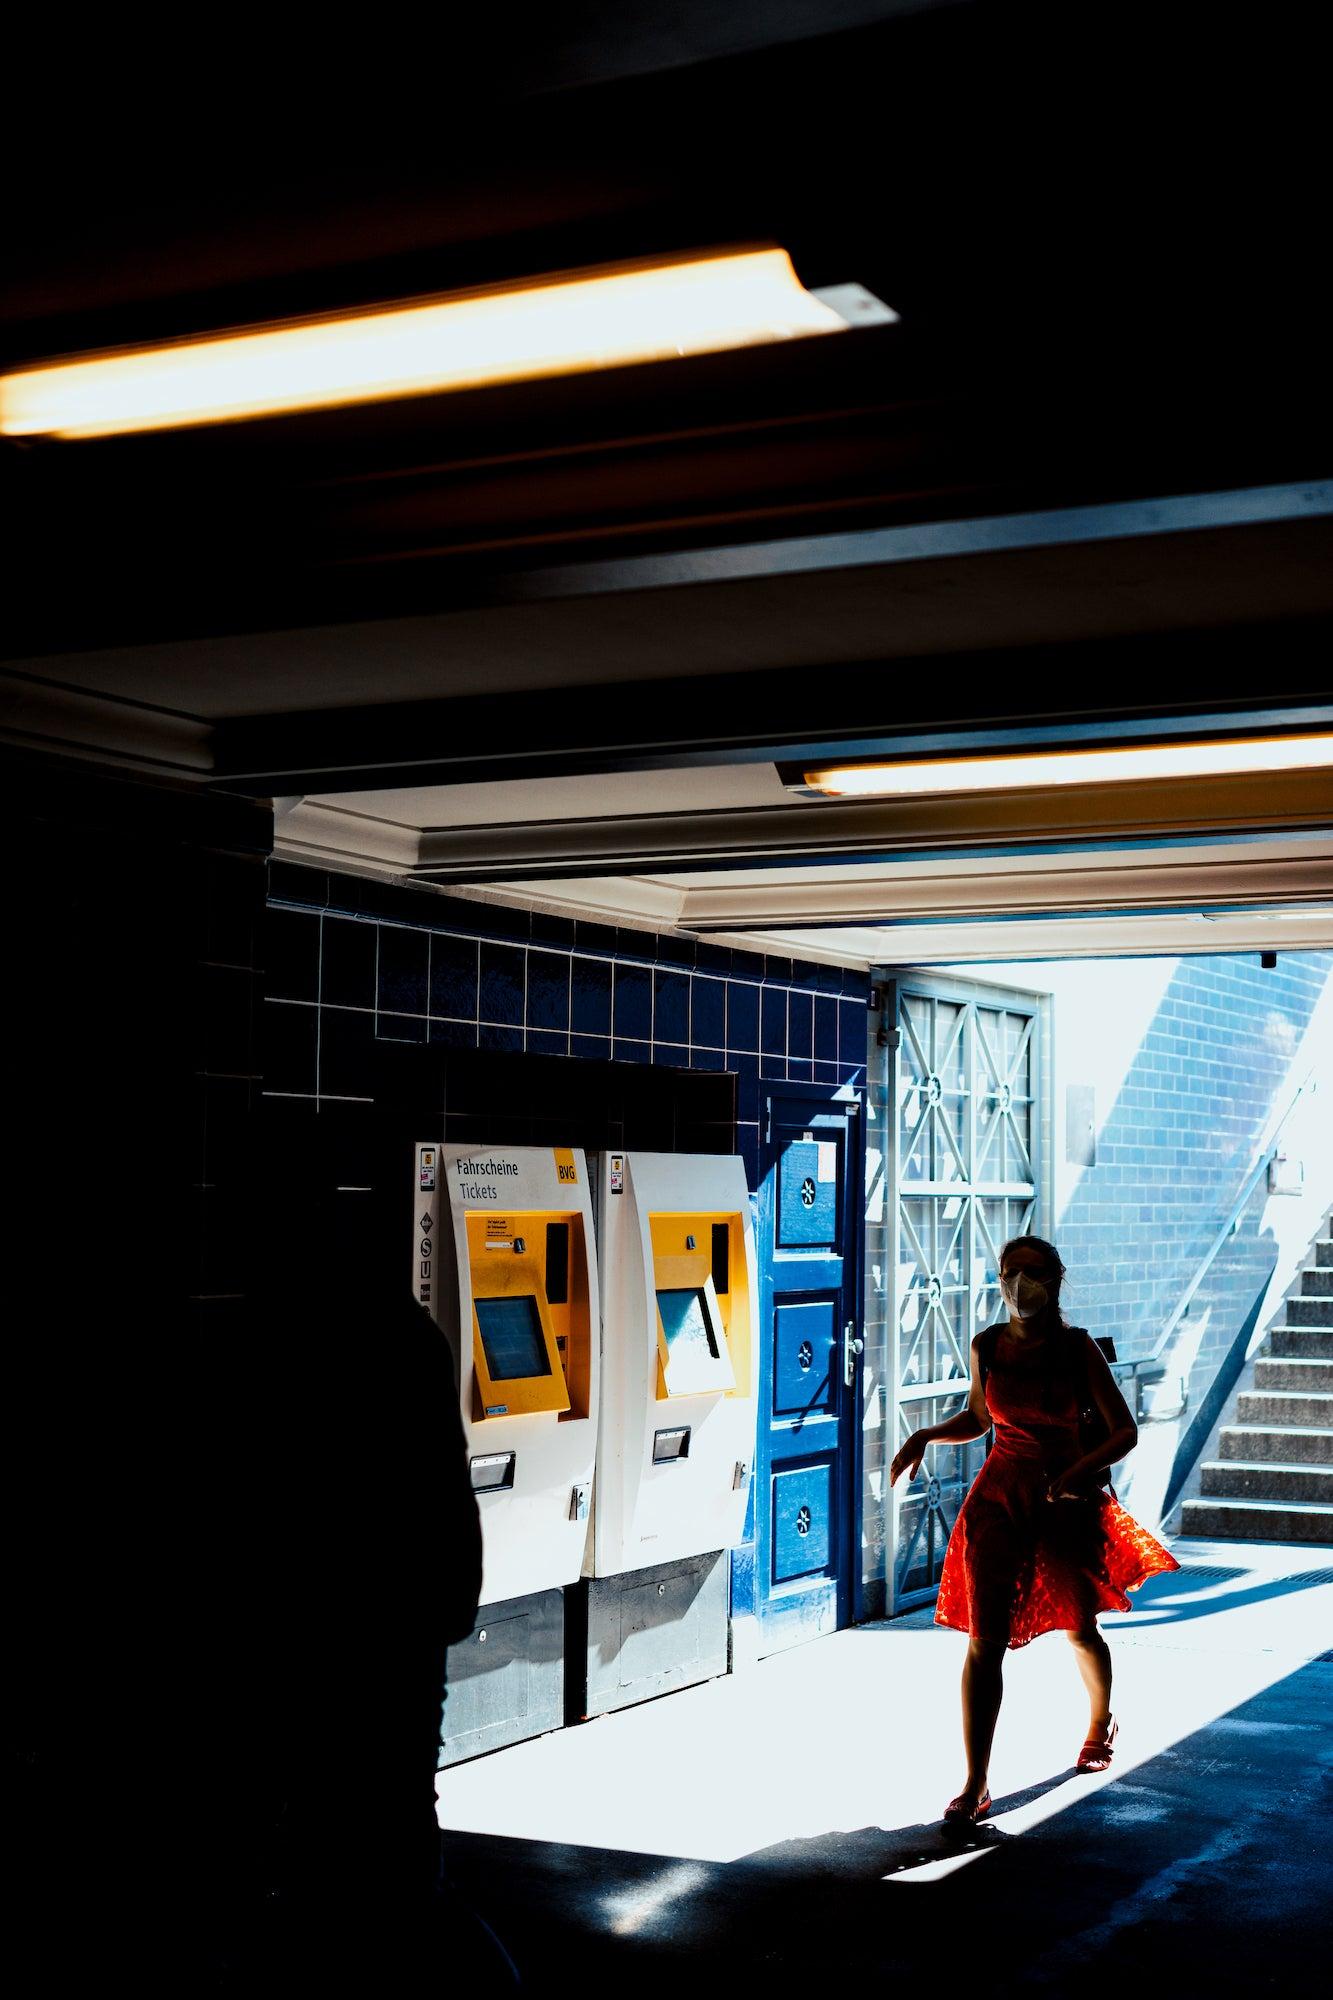 Alpha-Universe-Street-Photography-Marco-Wilm-35GM-4.jpg